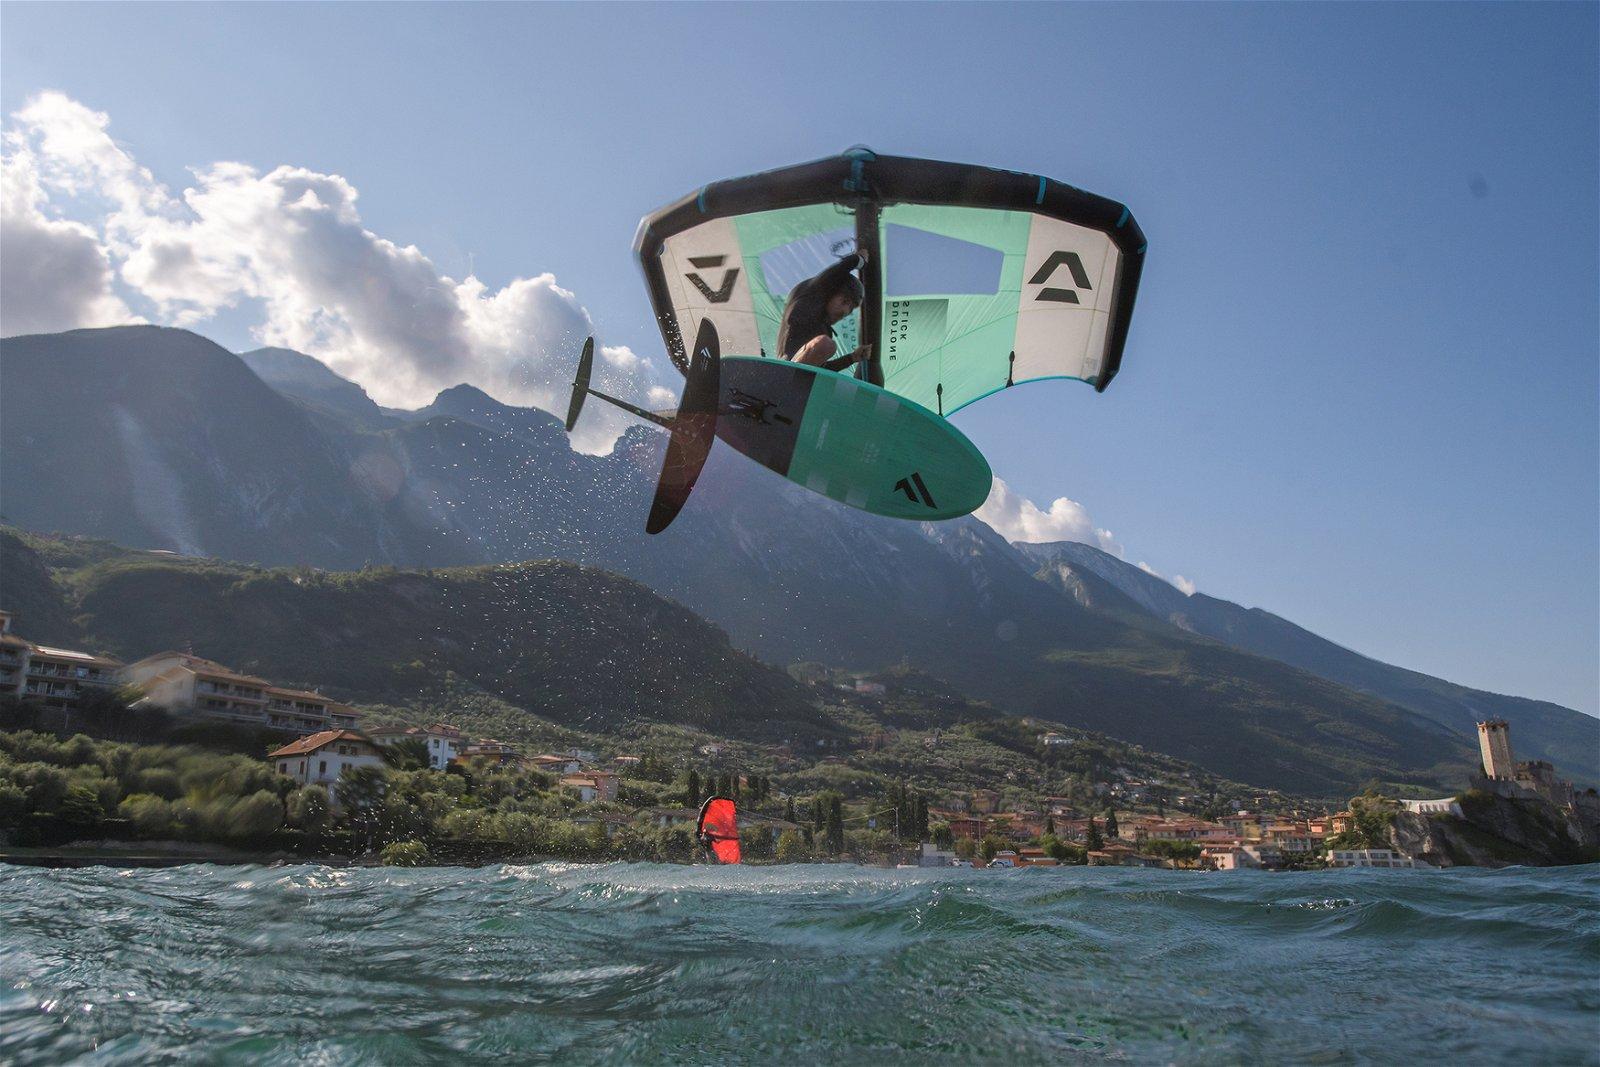 StefanSpiessberger SLICK22 SkyWingTE22 Gardasee by RonnyKiaulehn Fanatic Duotone-2933